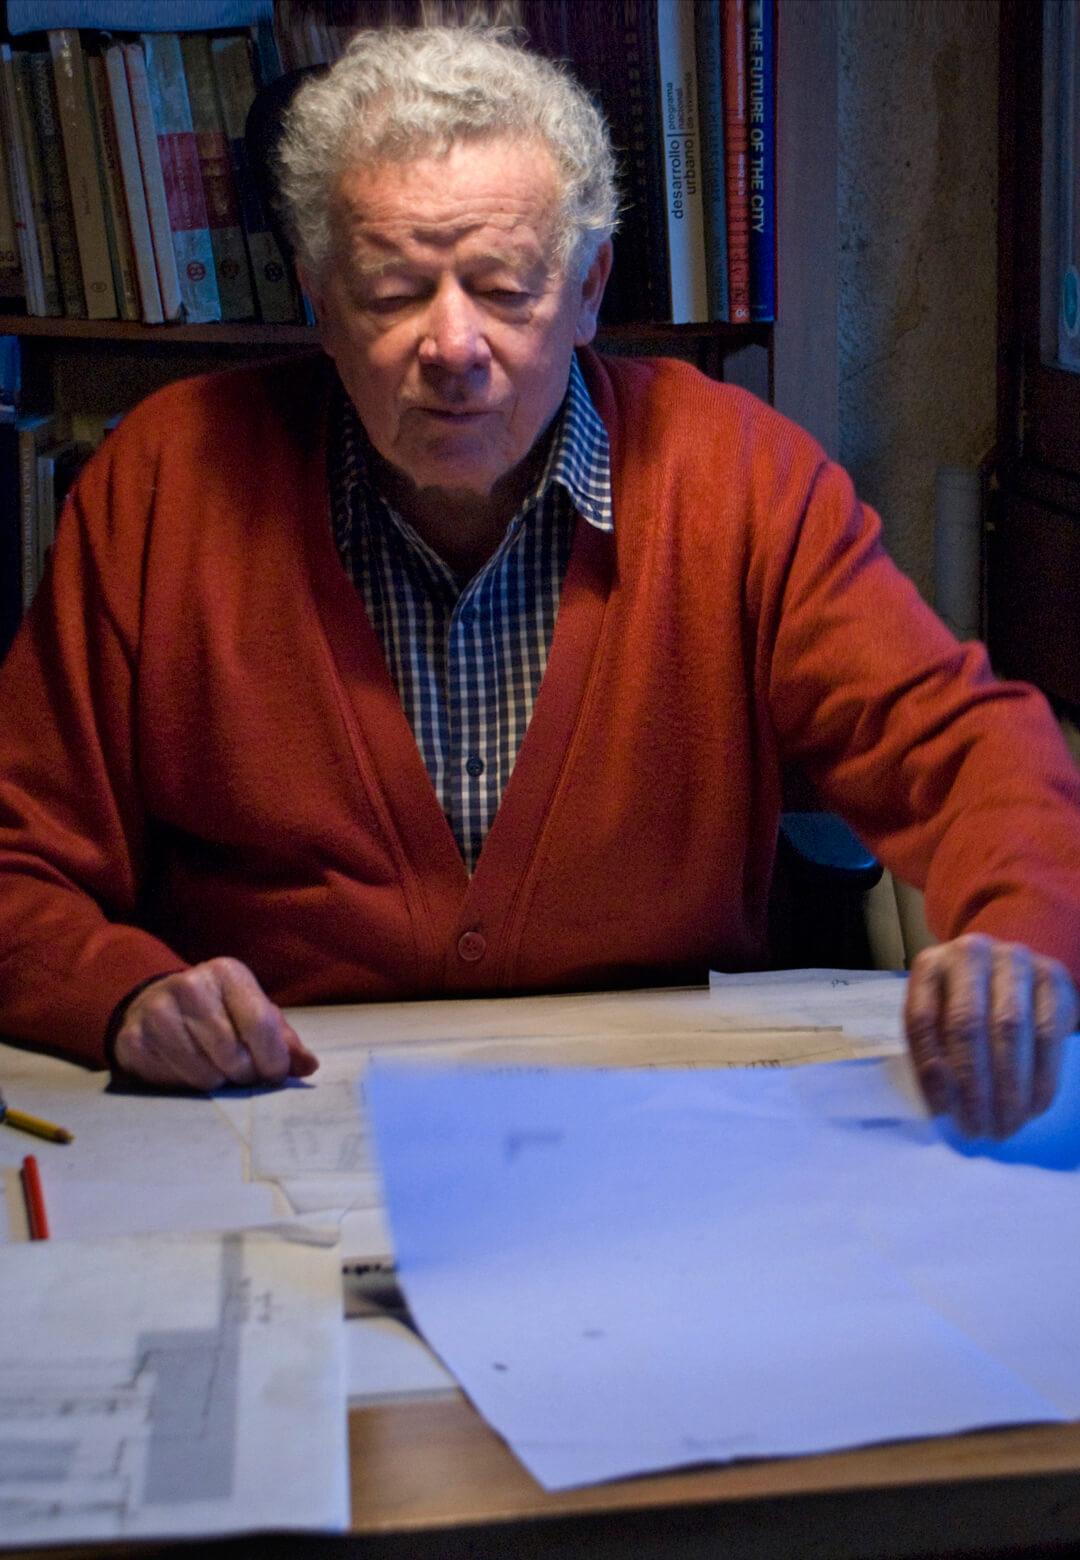 Colombian architect German Samper Gnecco (1924–2019) | Lessons Learnt | German Samper Gnecco | Manuela Neu | STIRworld